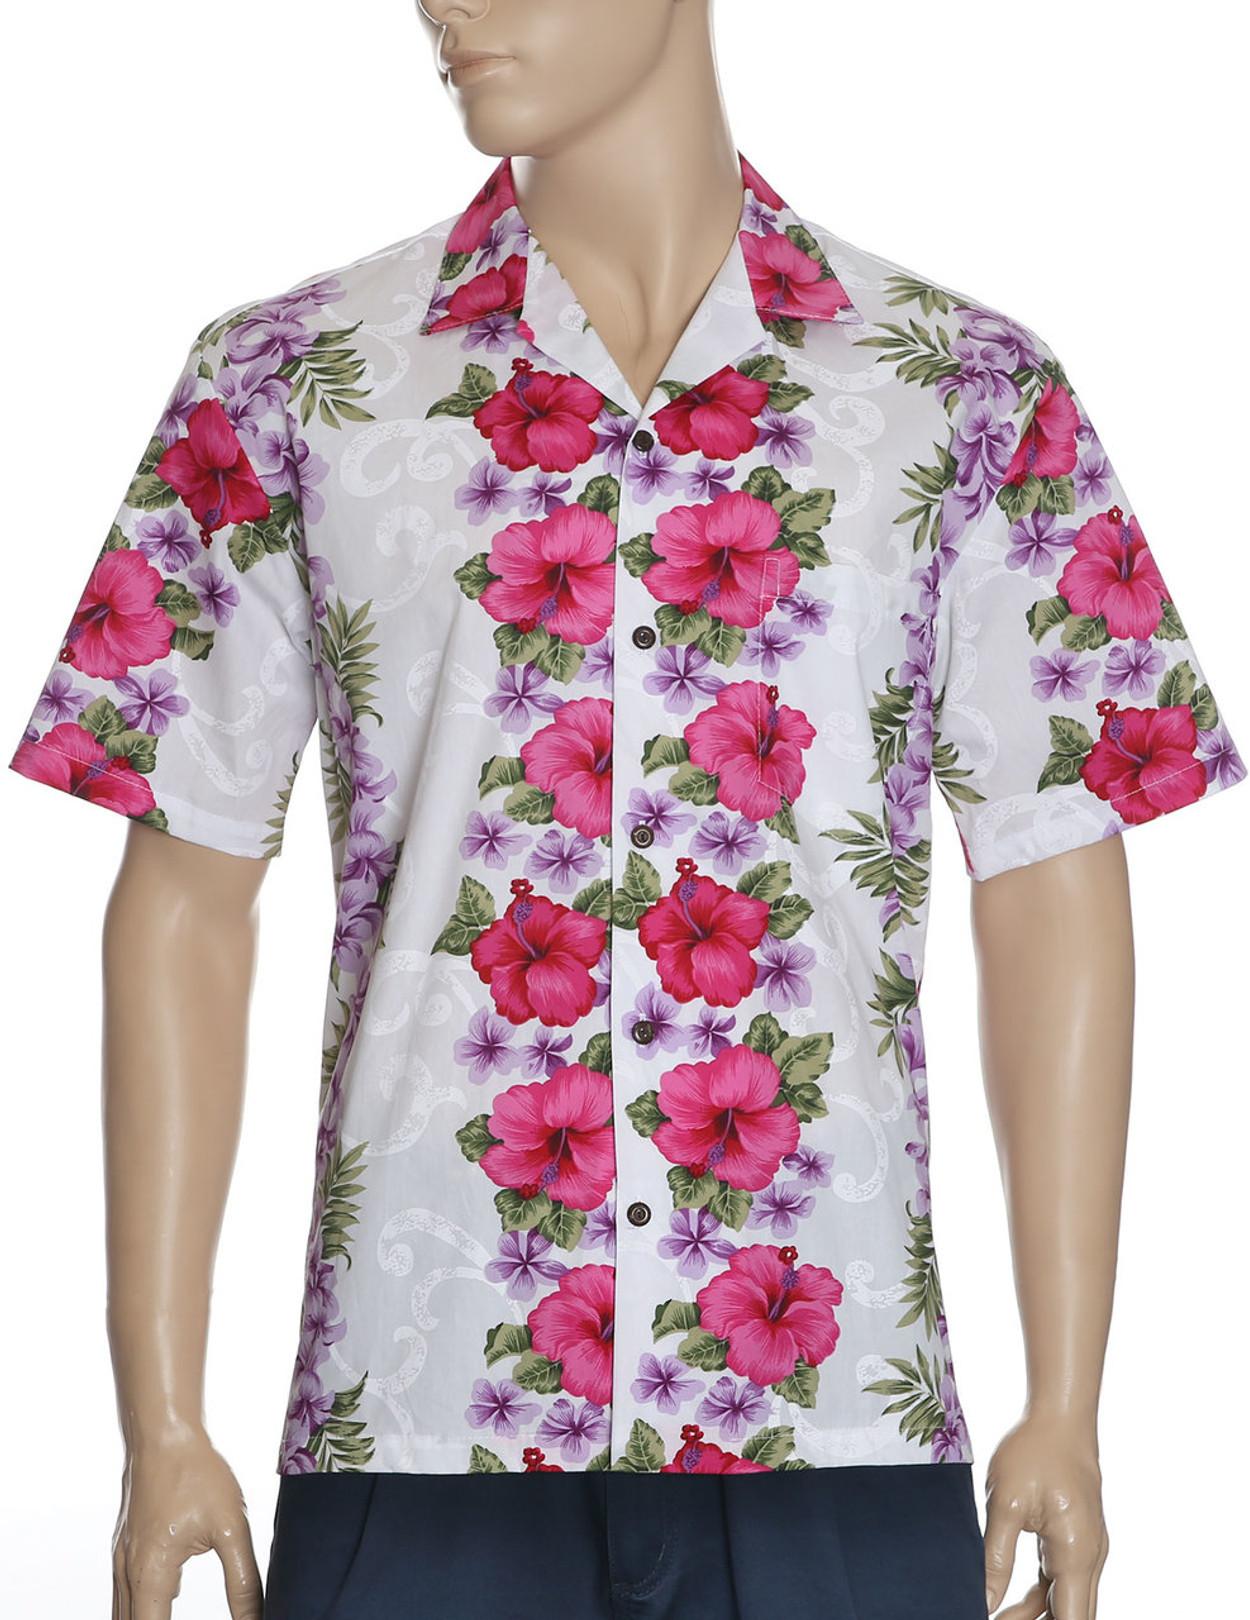 ce513a6e Hawaiian Red Hibiscus Shirt - Big Island 100% Cotton Fabric Open Pointed  Folded Collar Genuine